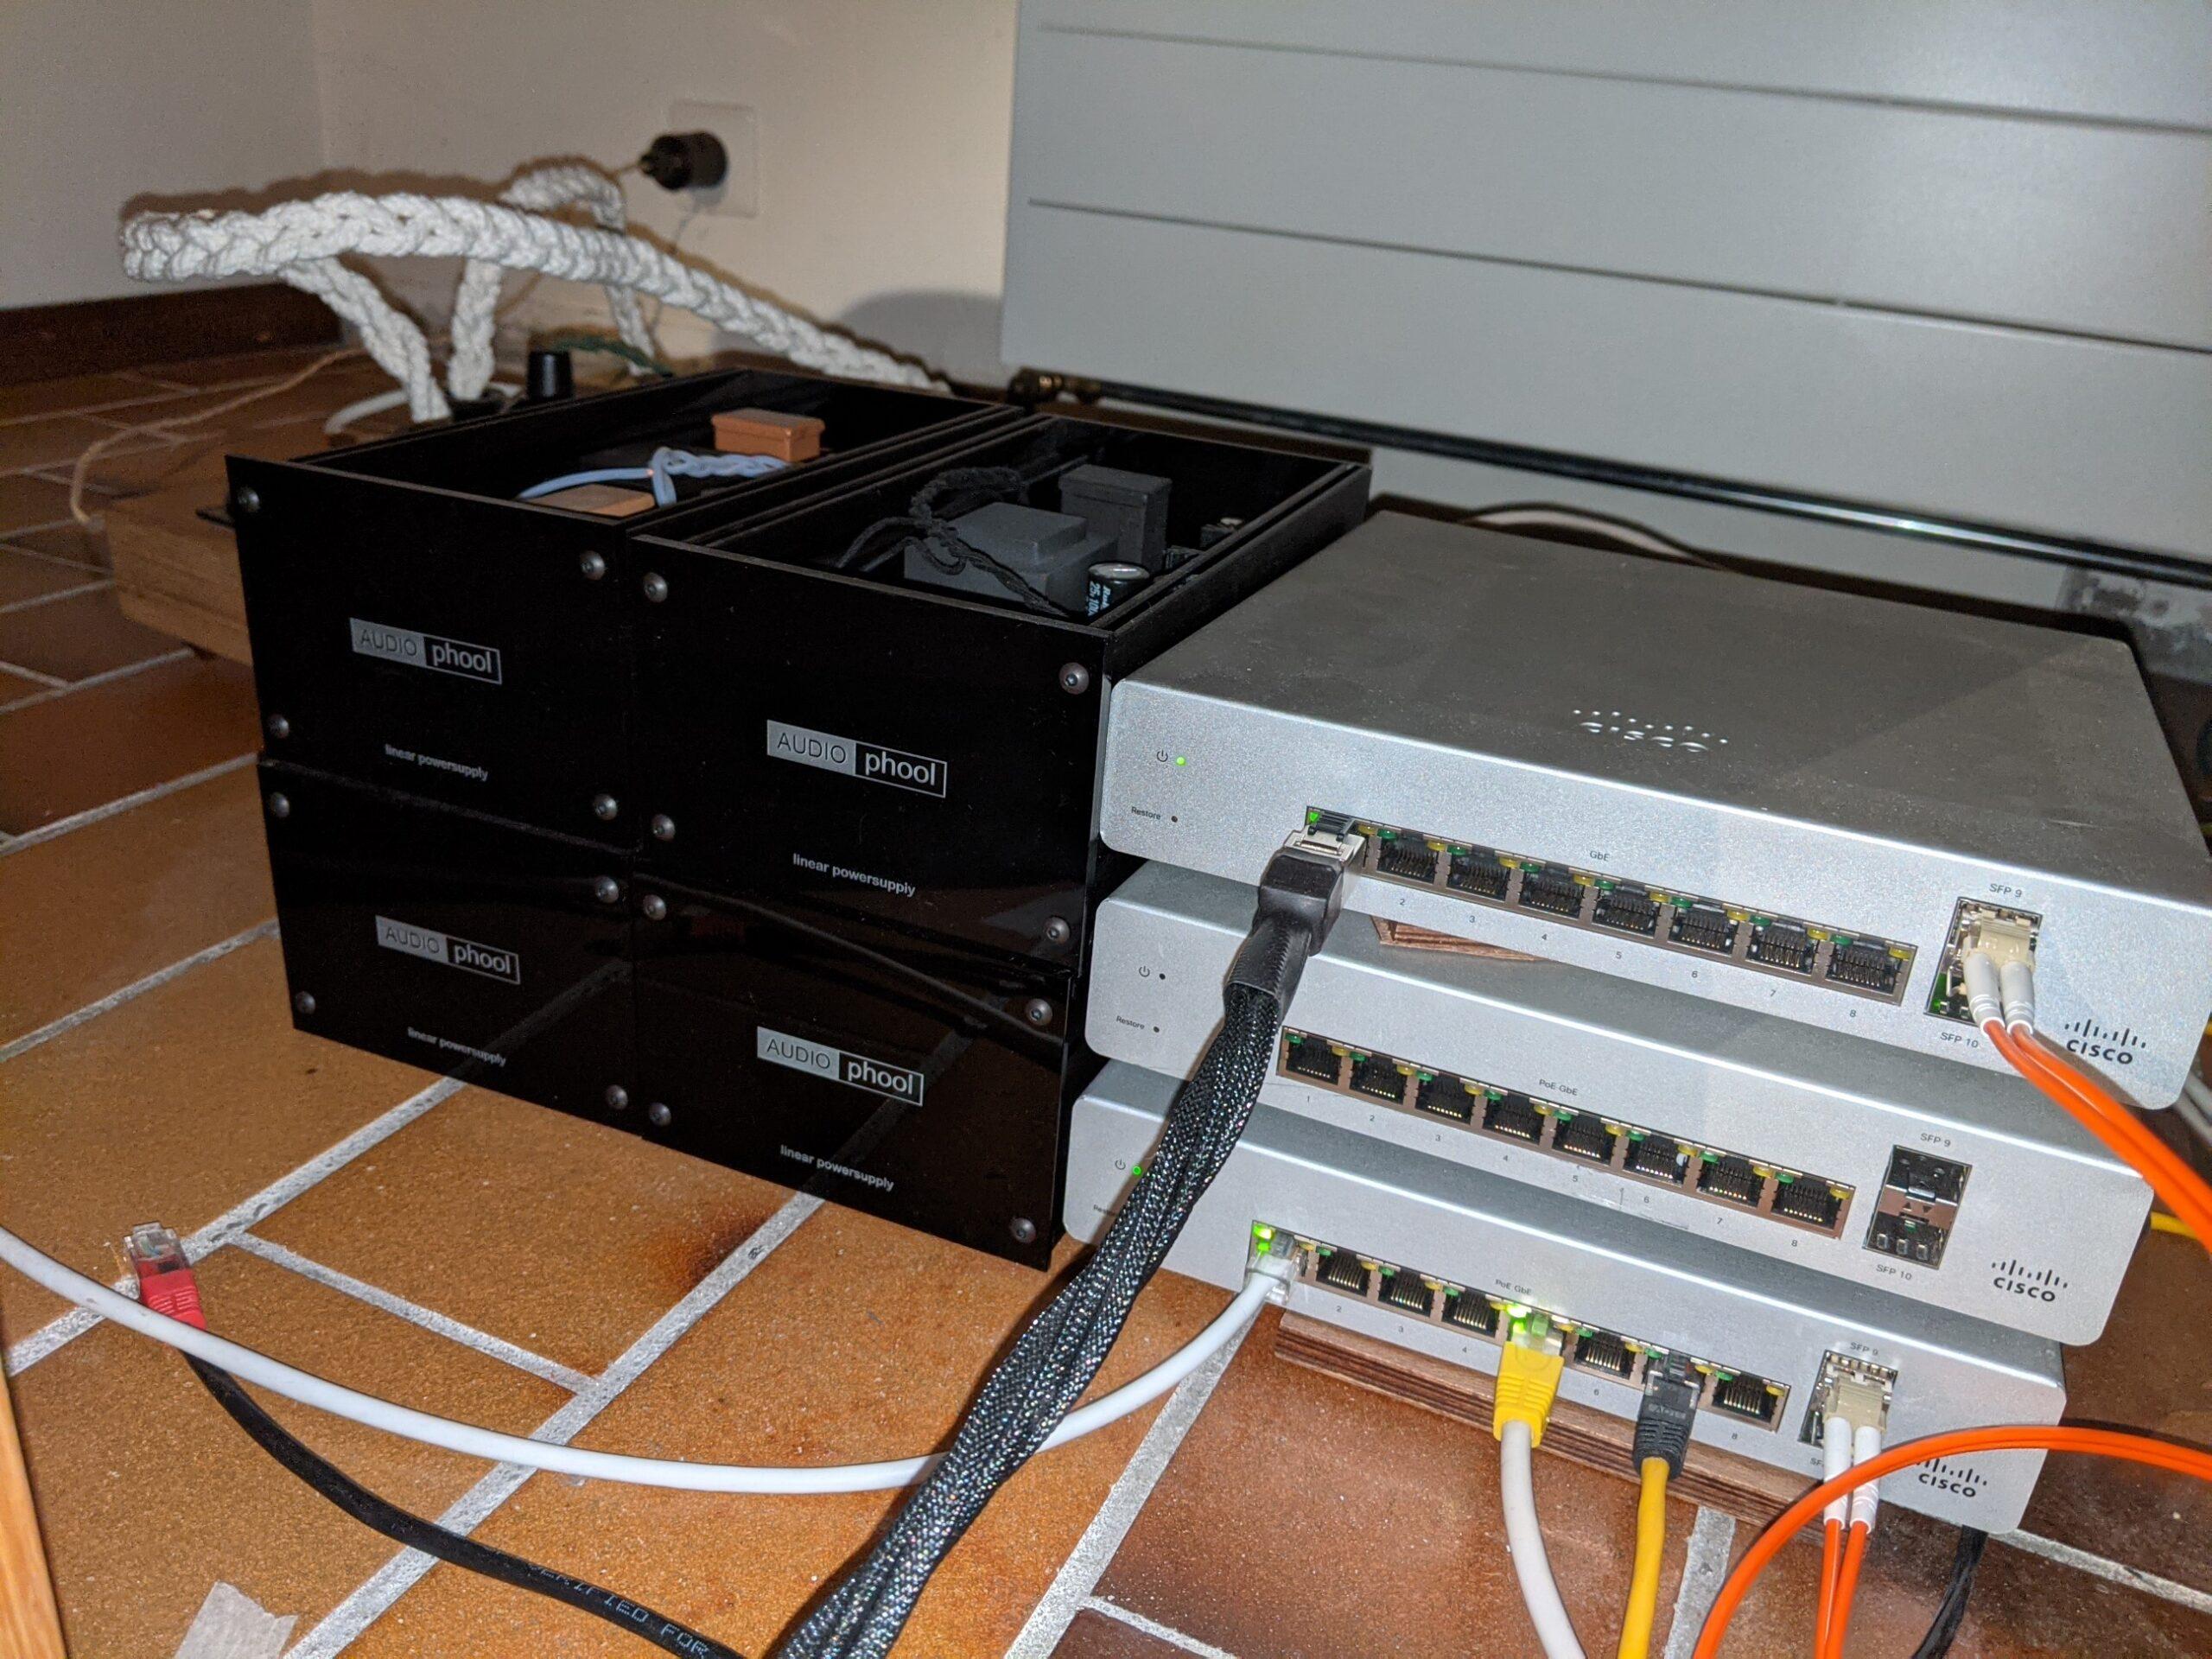 Upgraded Cisco Meraki and linear PSU